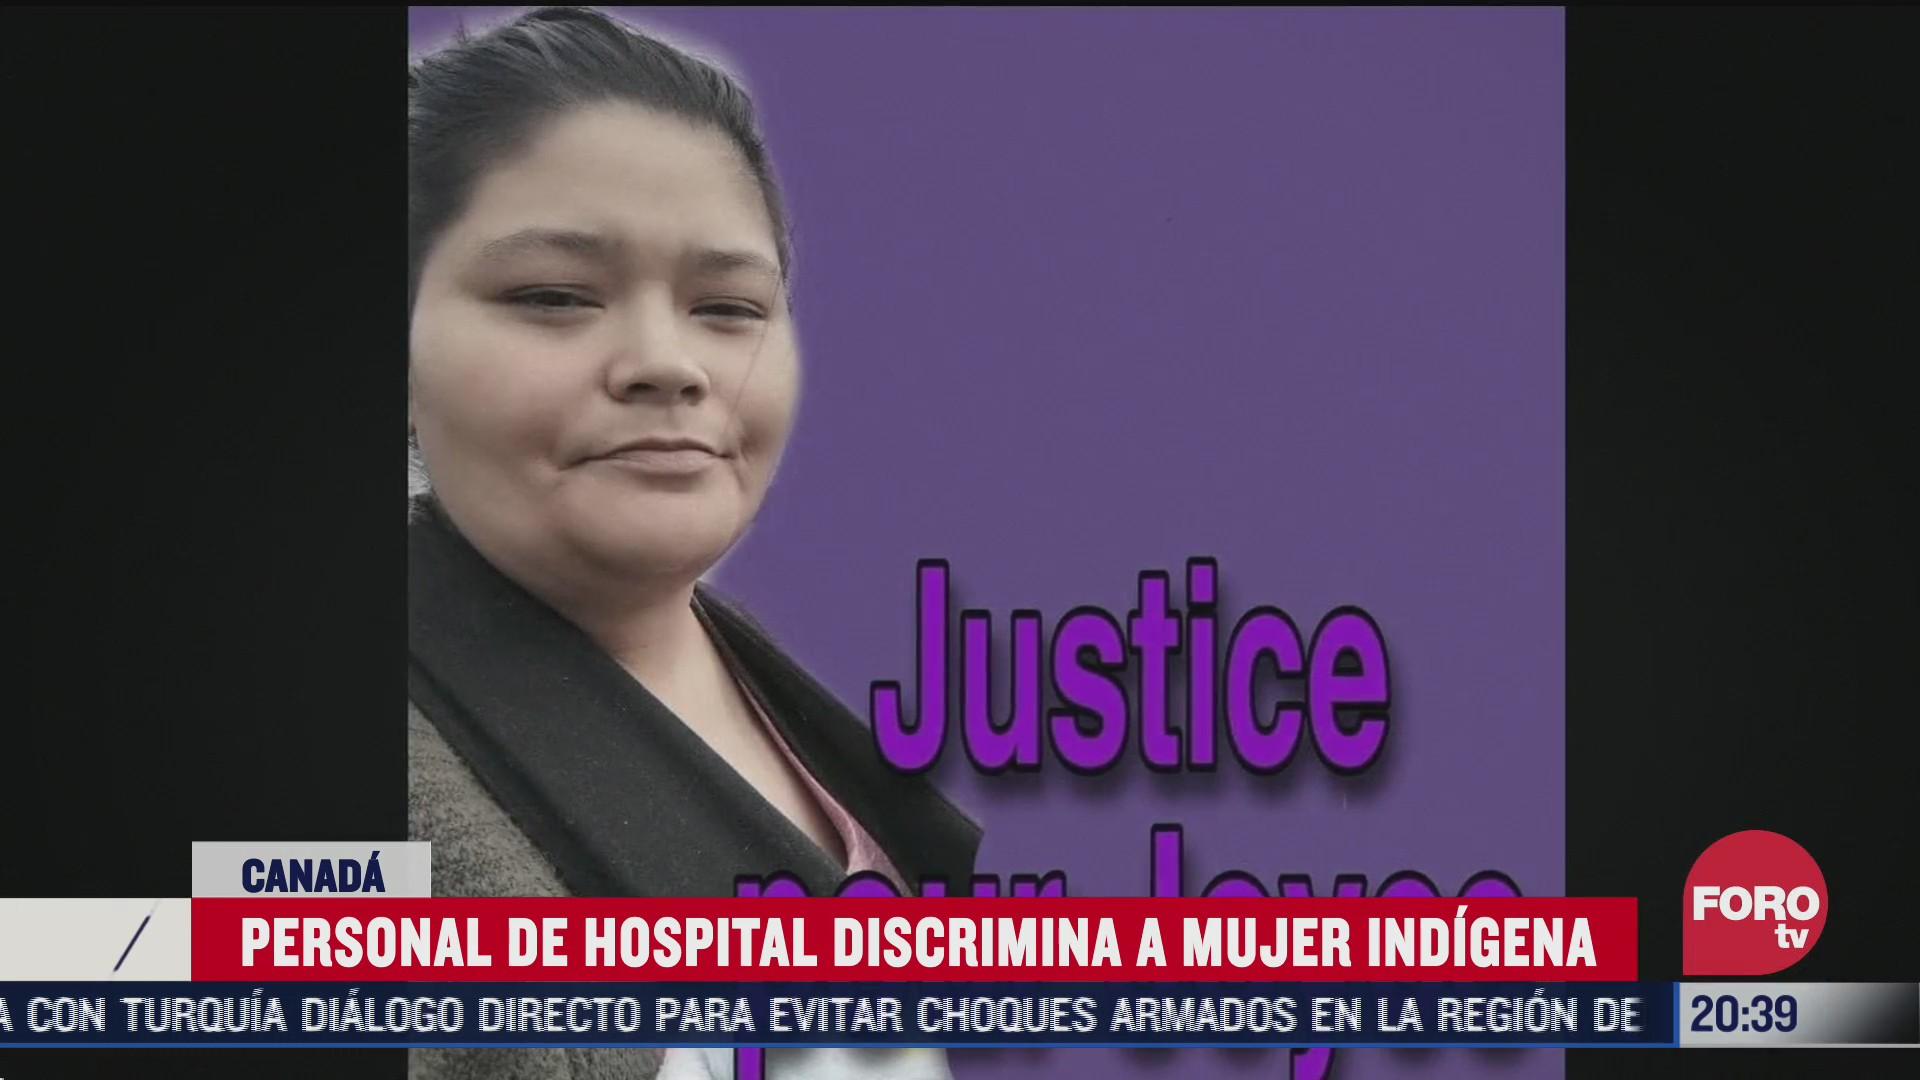 discriminan a mujer indigena en hospital de canada